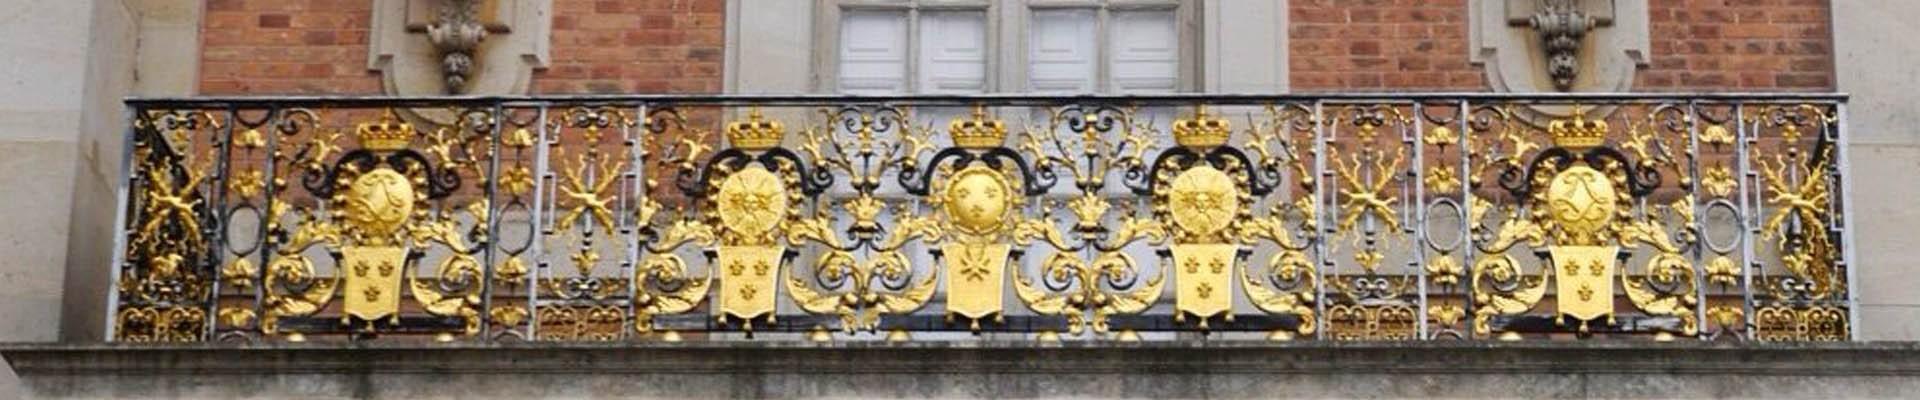 Balcon de Louis XIV, Château de Versailles